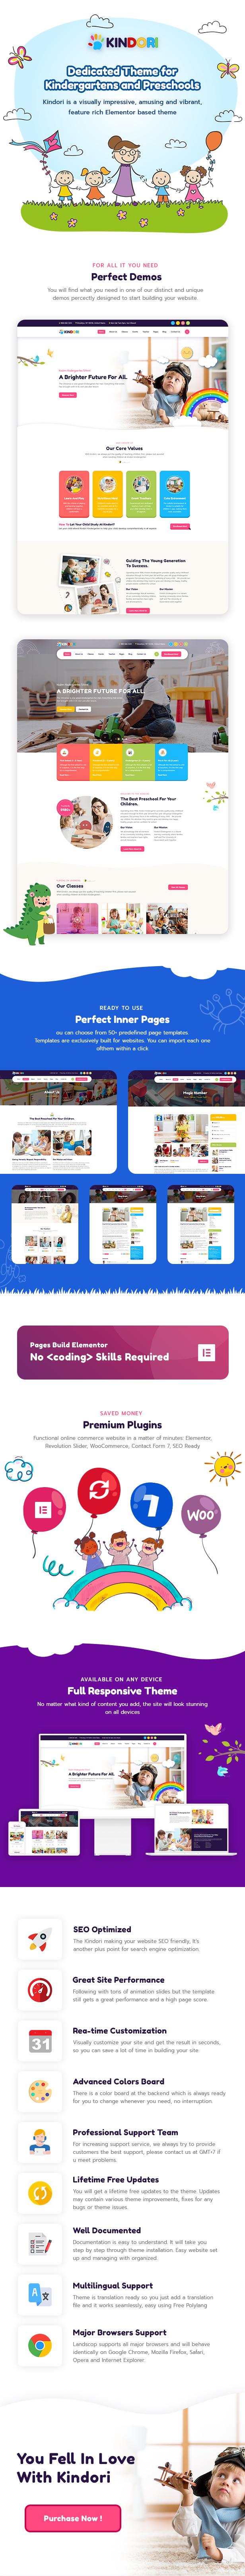 Kindori - School Kindergarten WordPress Theme - 1